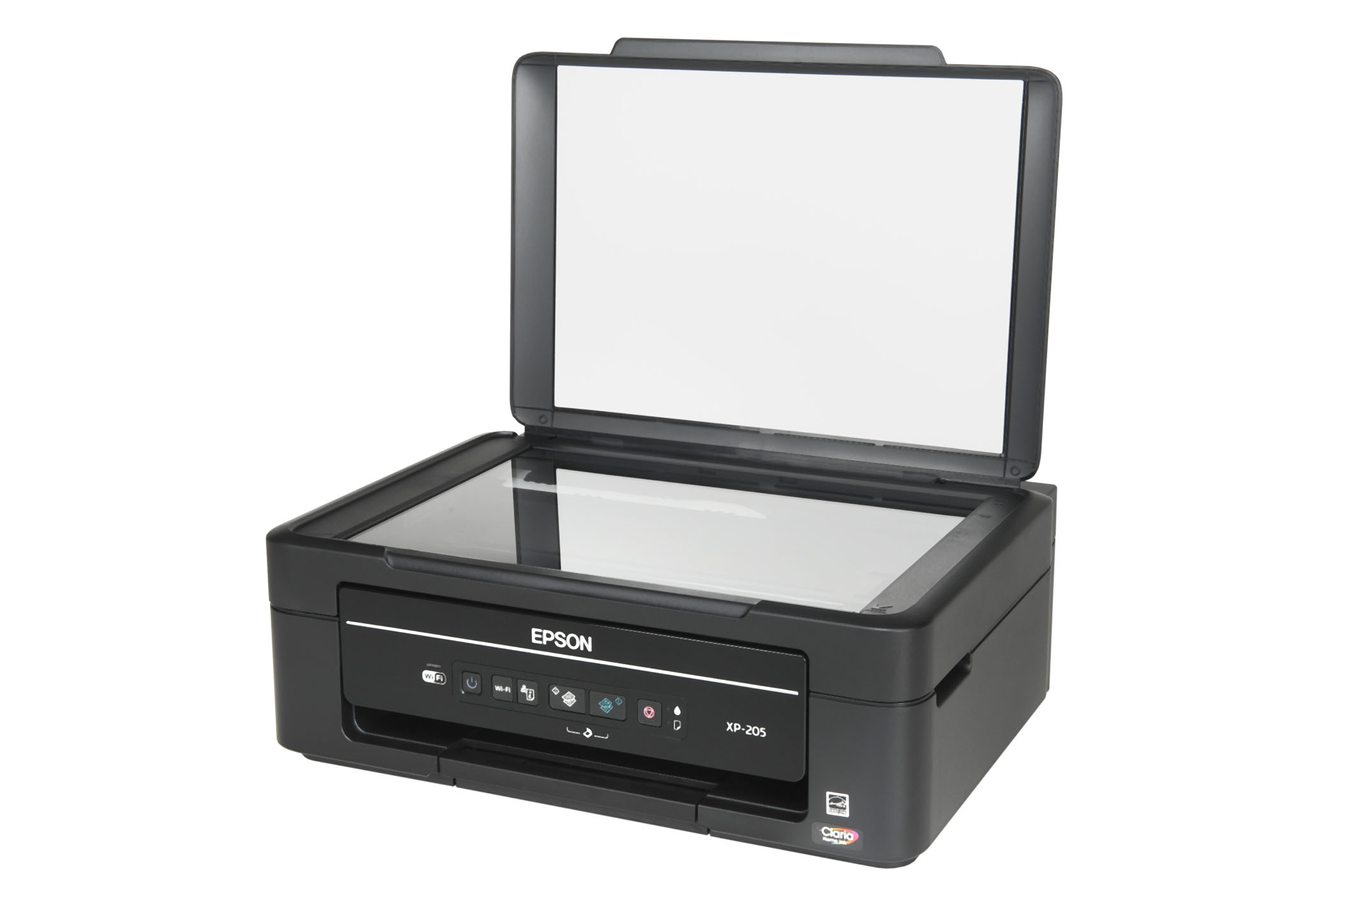 imprimante jet d 39 encre epson epression home xp 205 3629198 darty. Black Bedroom Furniture Sets. Home Design Ideas